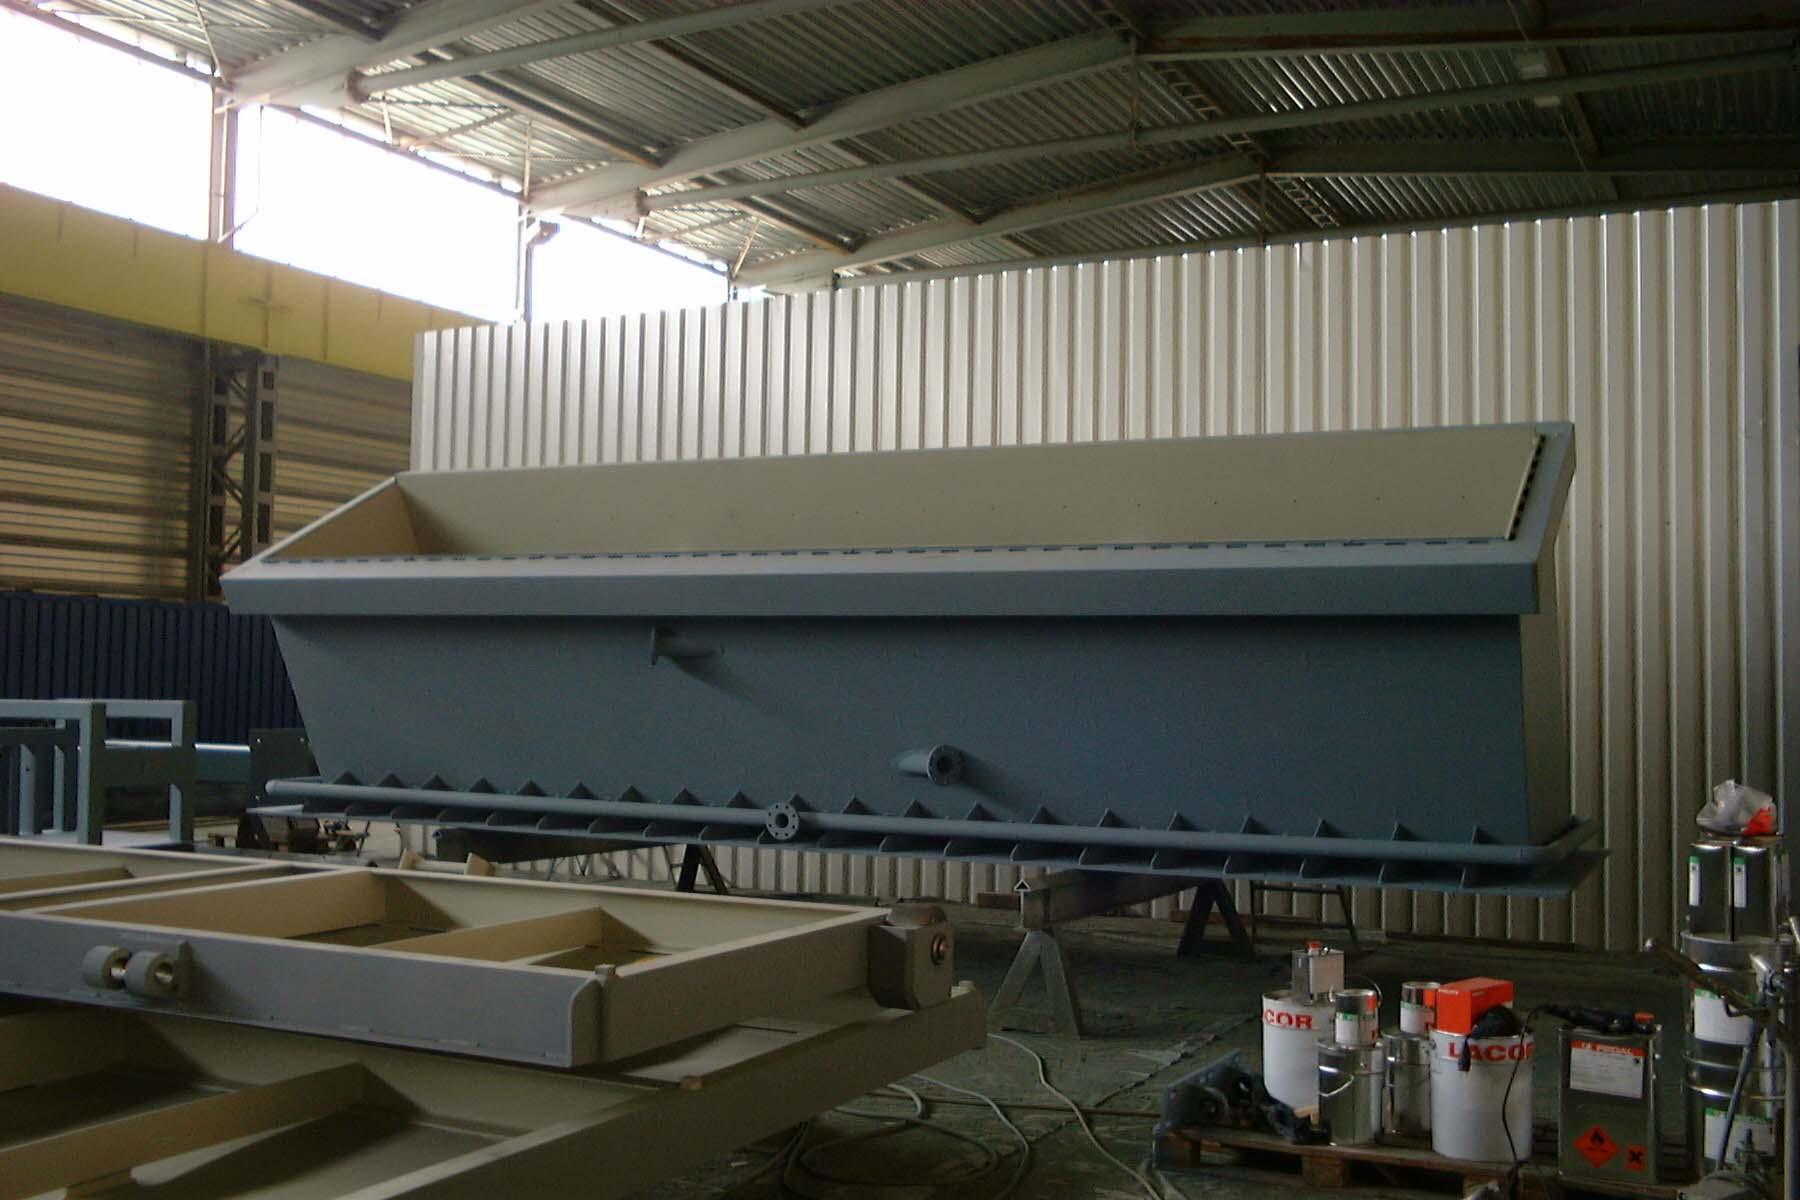 Unterteil Müll Füller / Part of a waste feed chute